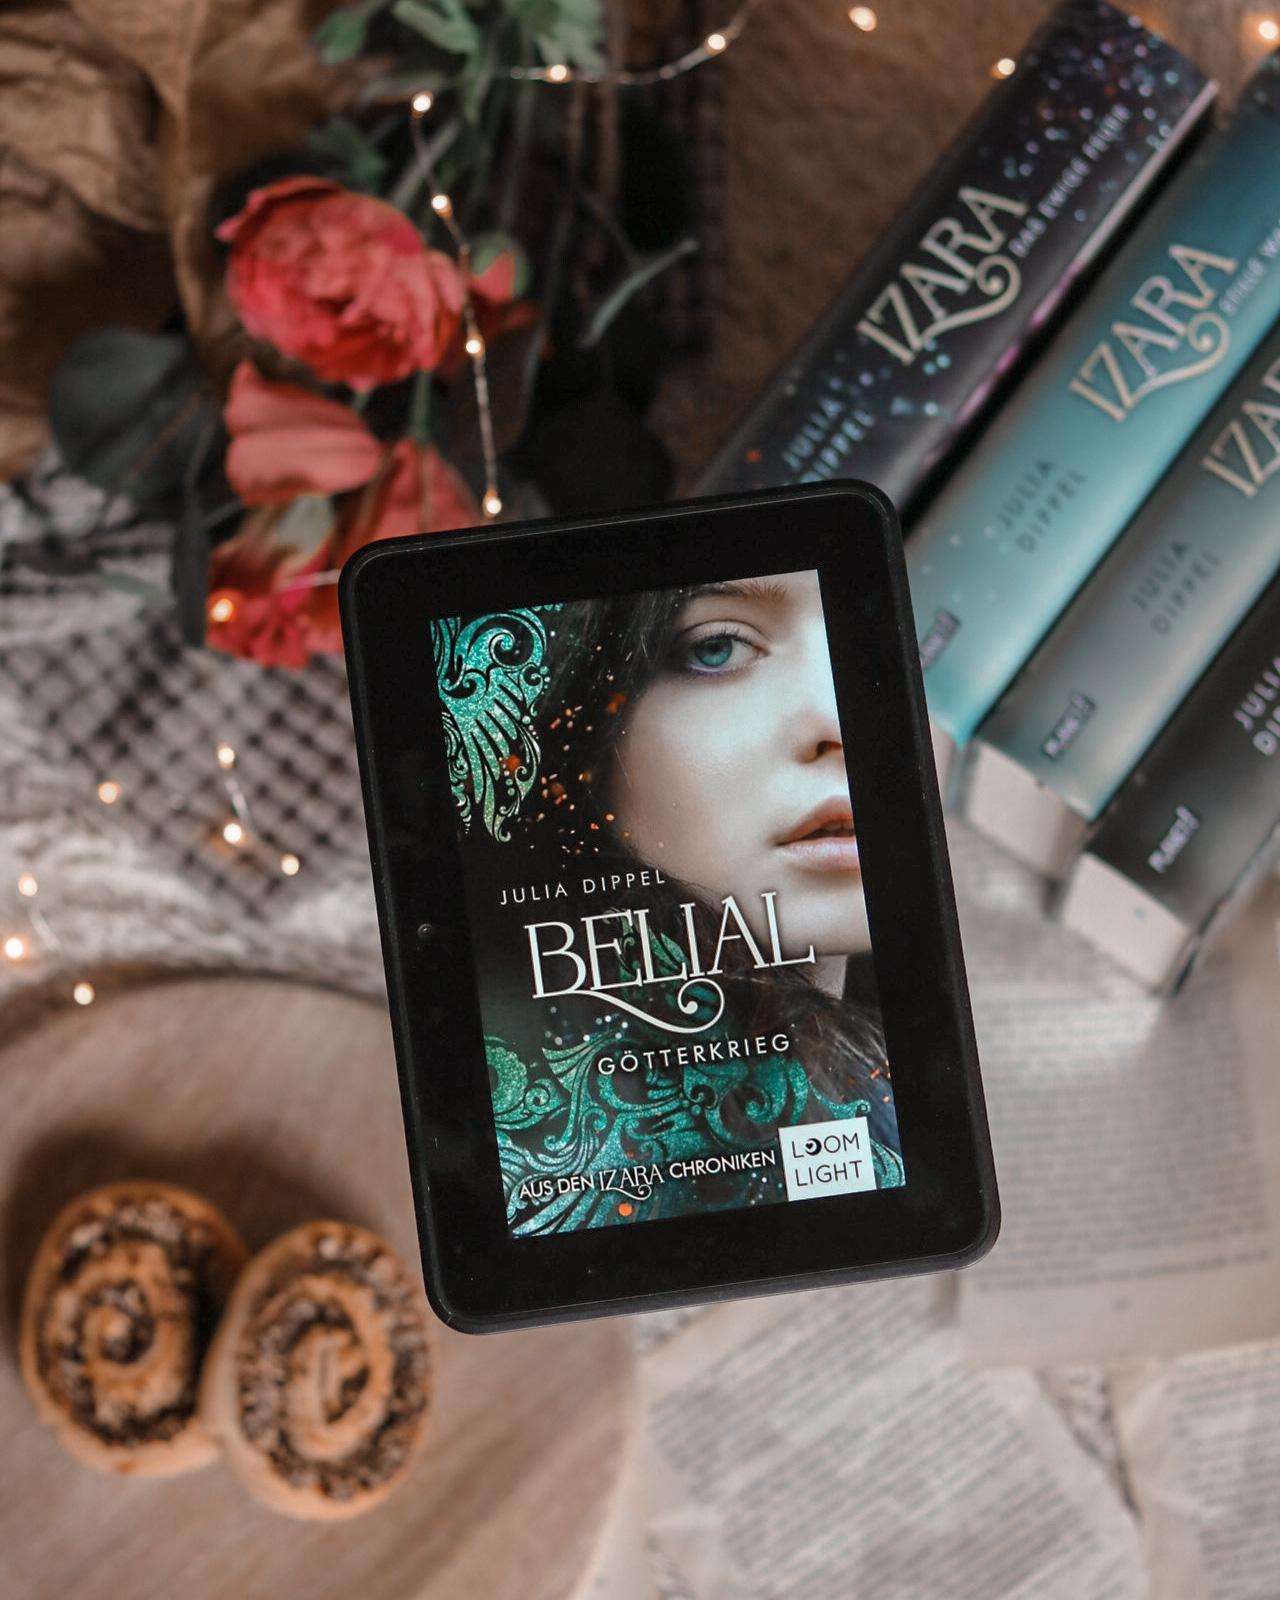 Belial – Götterkrieg / Izara 5 | Julia Dippel